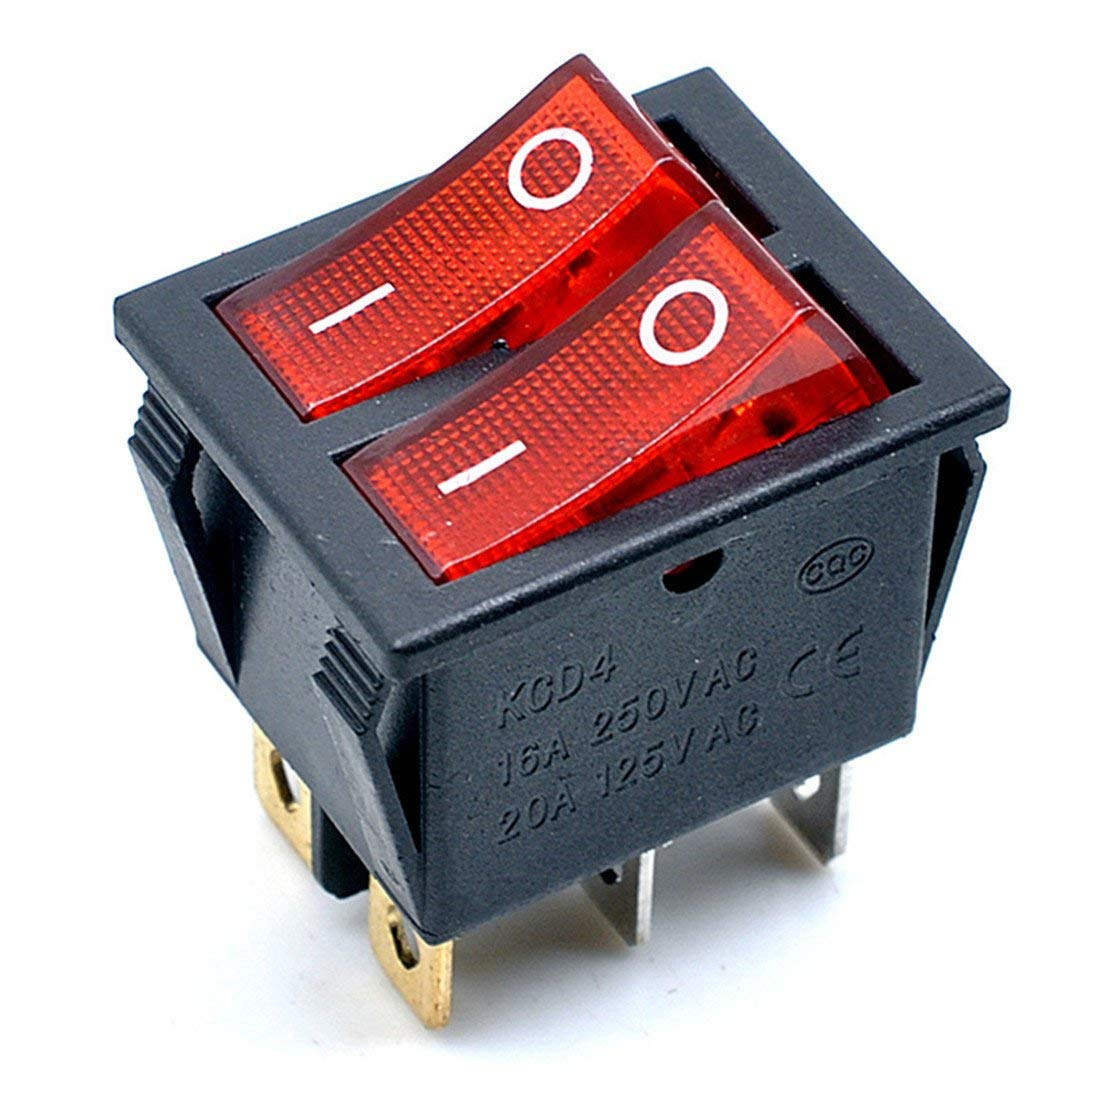 Interruptor basculante para Barco Willwin Red Light Red Light 5 Piezas, KCD4 AC 250 V, 16 A, luz roja, 6 terminales, Encendido//Apagado, Doble SPST 2 V/ías